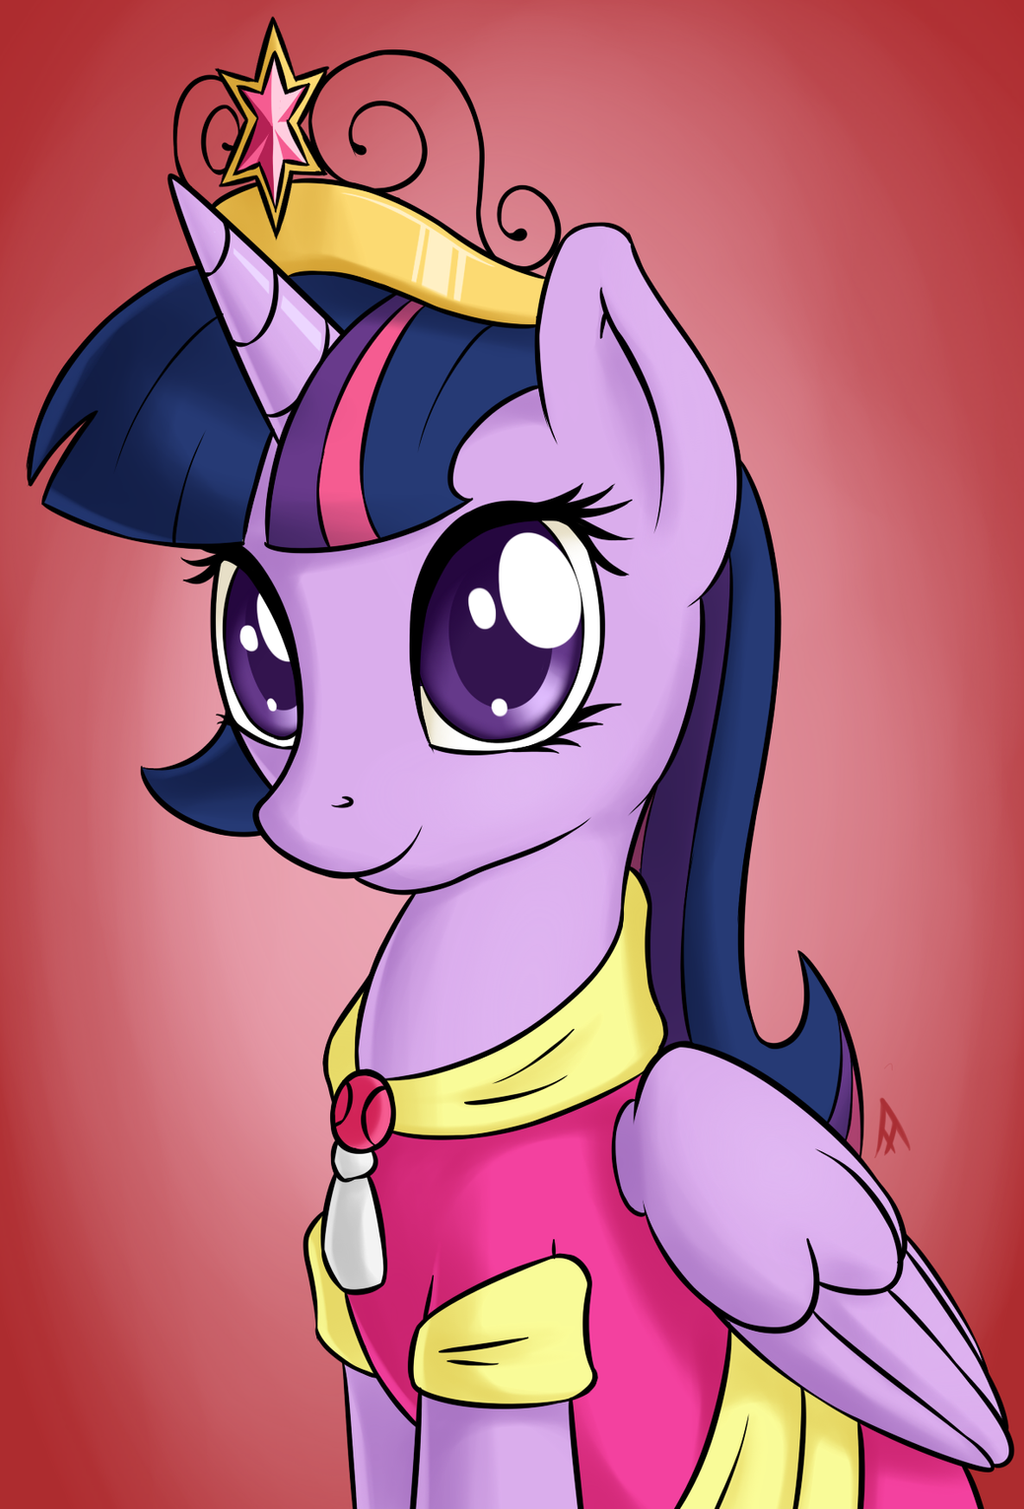 Princess by Magic by fearingFun